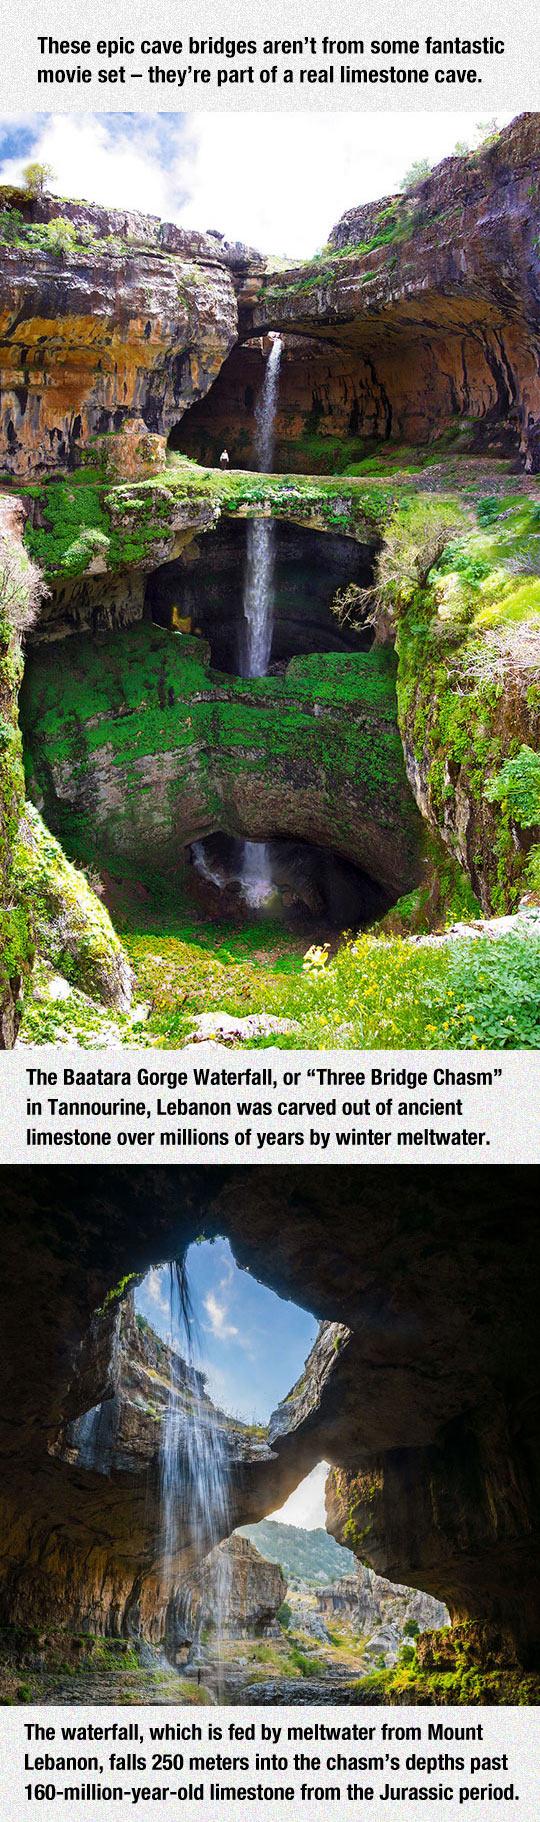 1-cool-cave-three-bridges-waterfall-movie